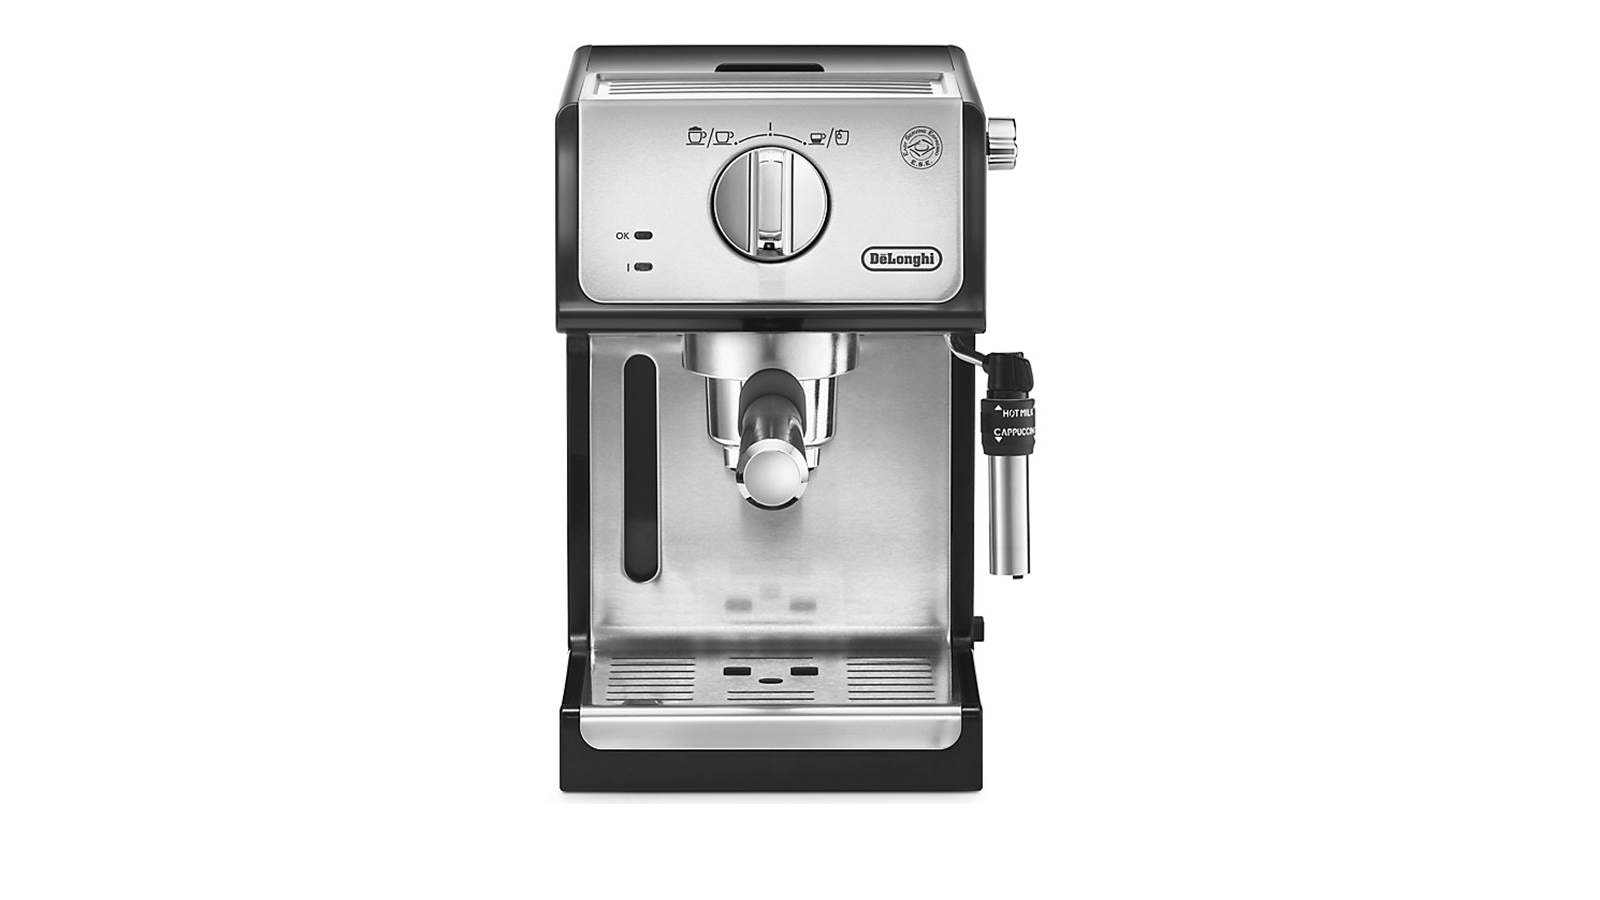 delonghi ecp pump espresso coffee machine